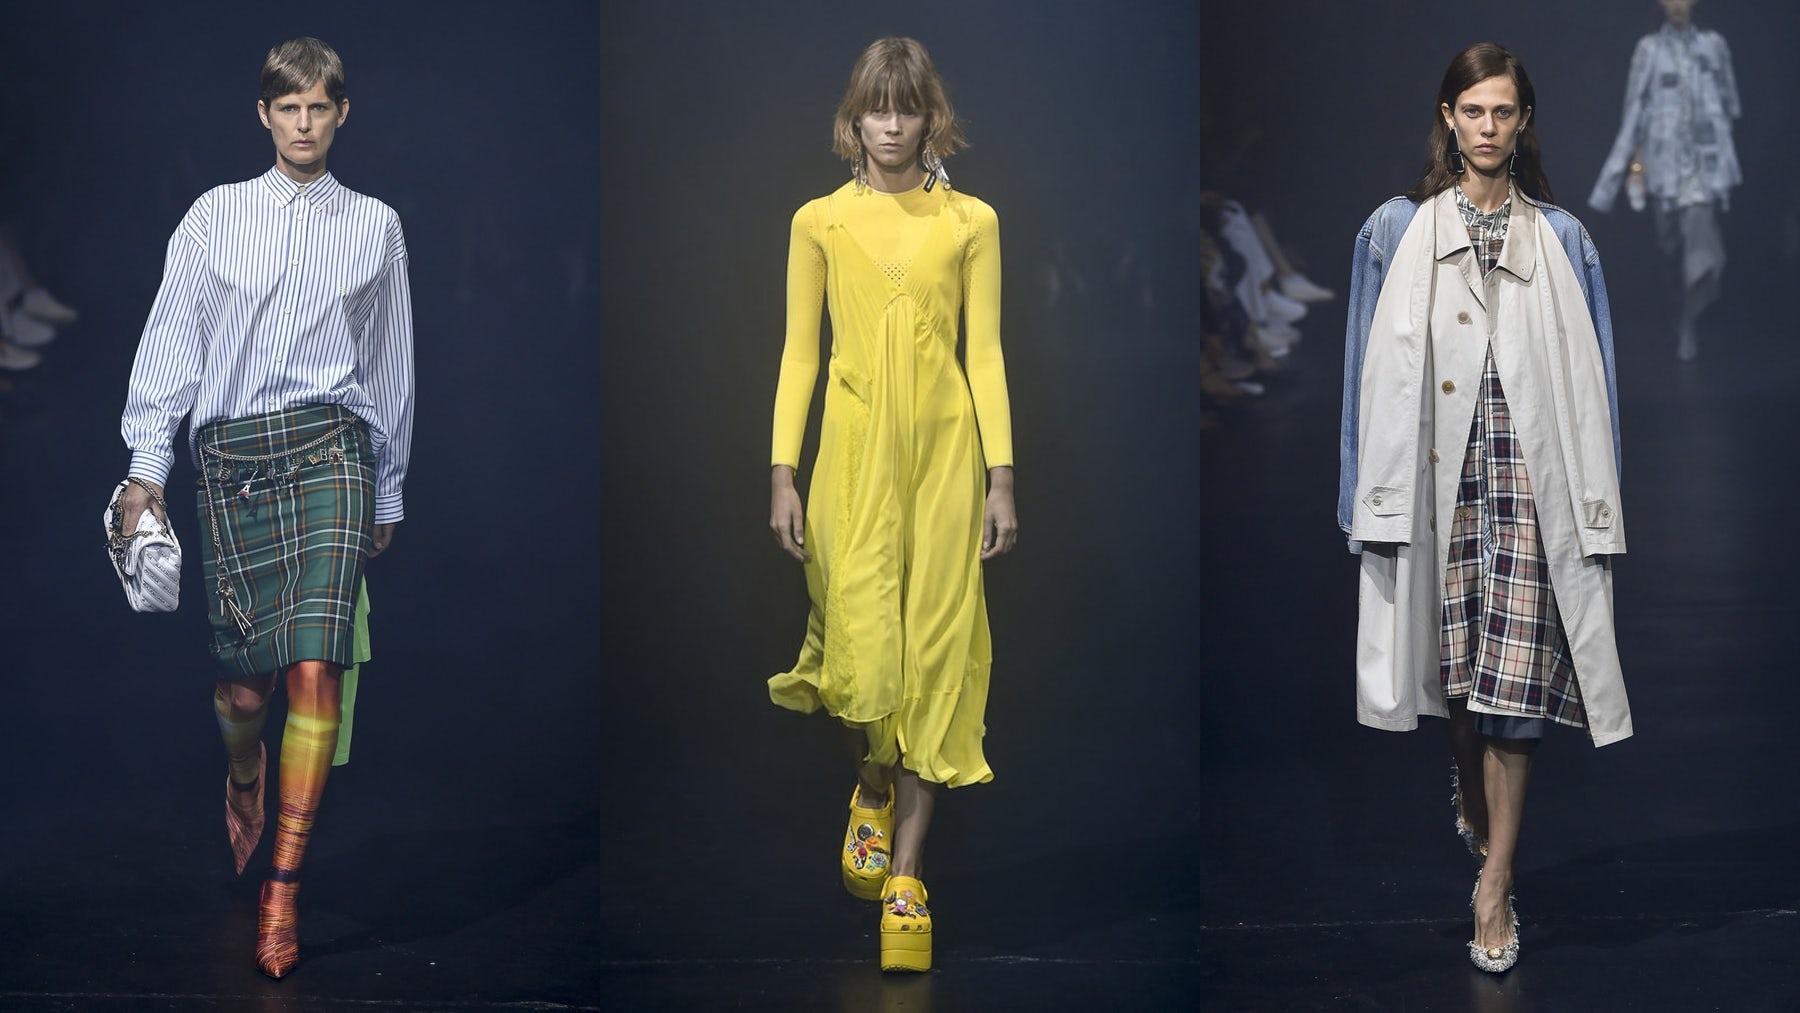 Balenciaga Unifies Men's and Women's Collections